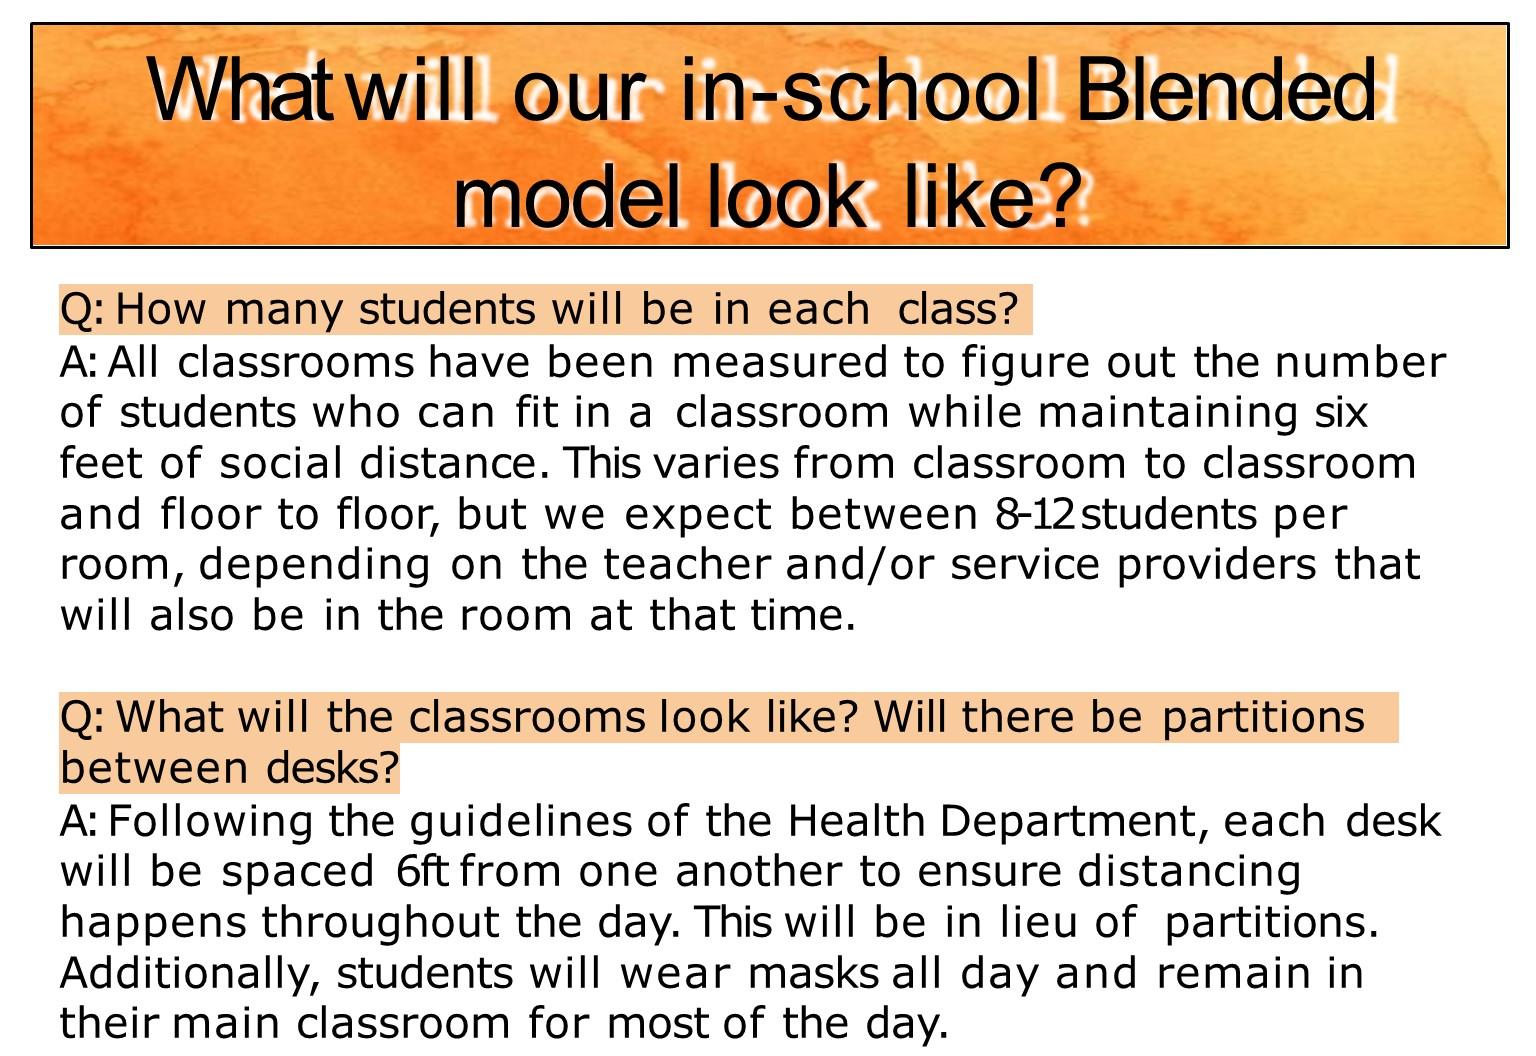 Information on blended learning